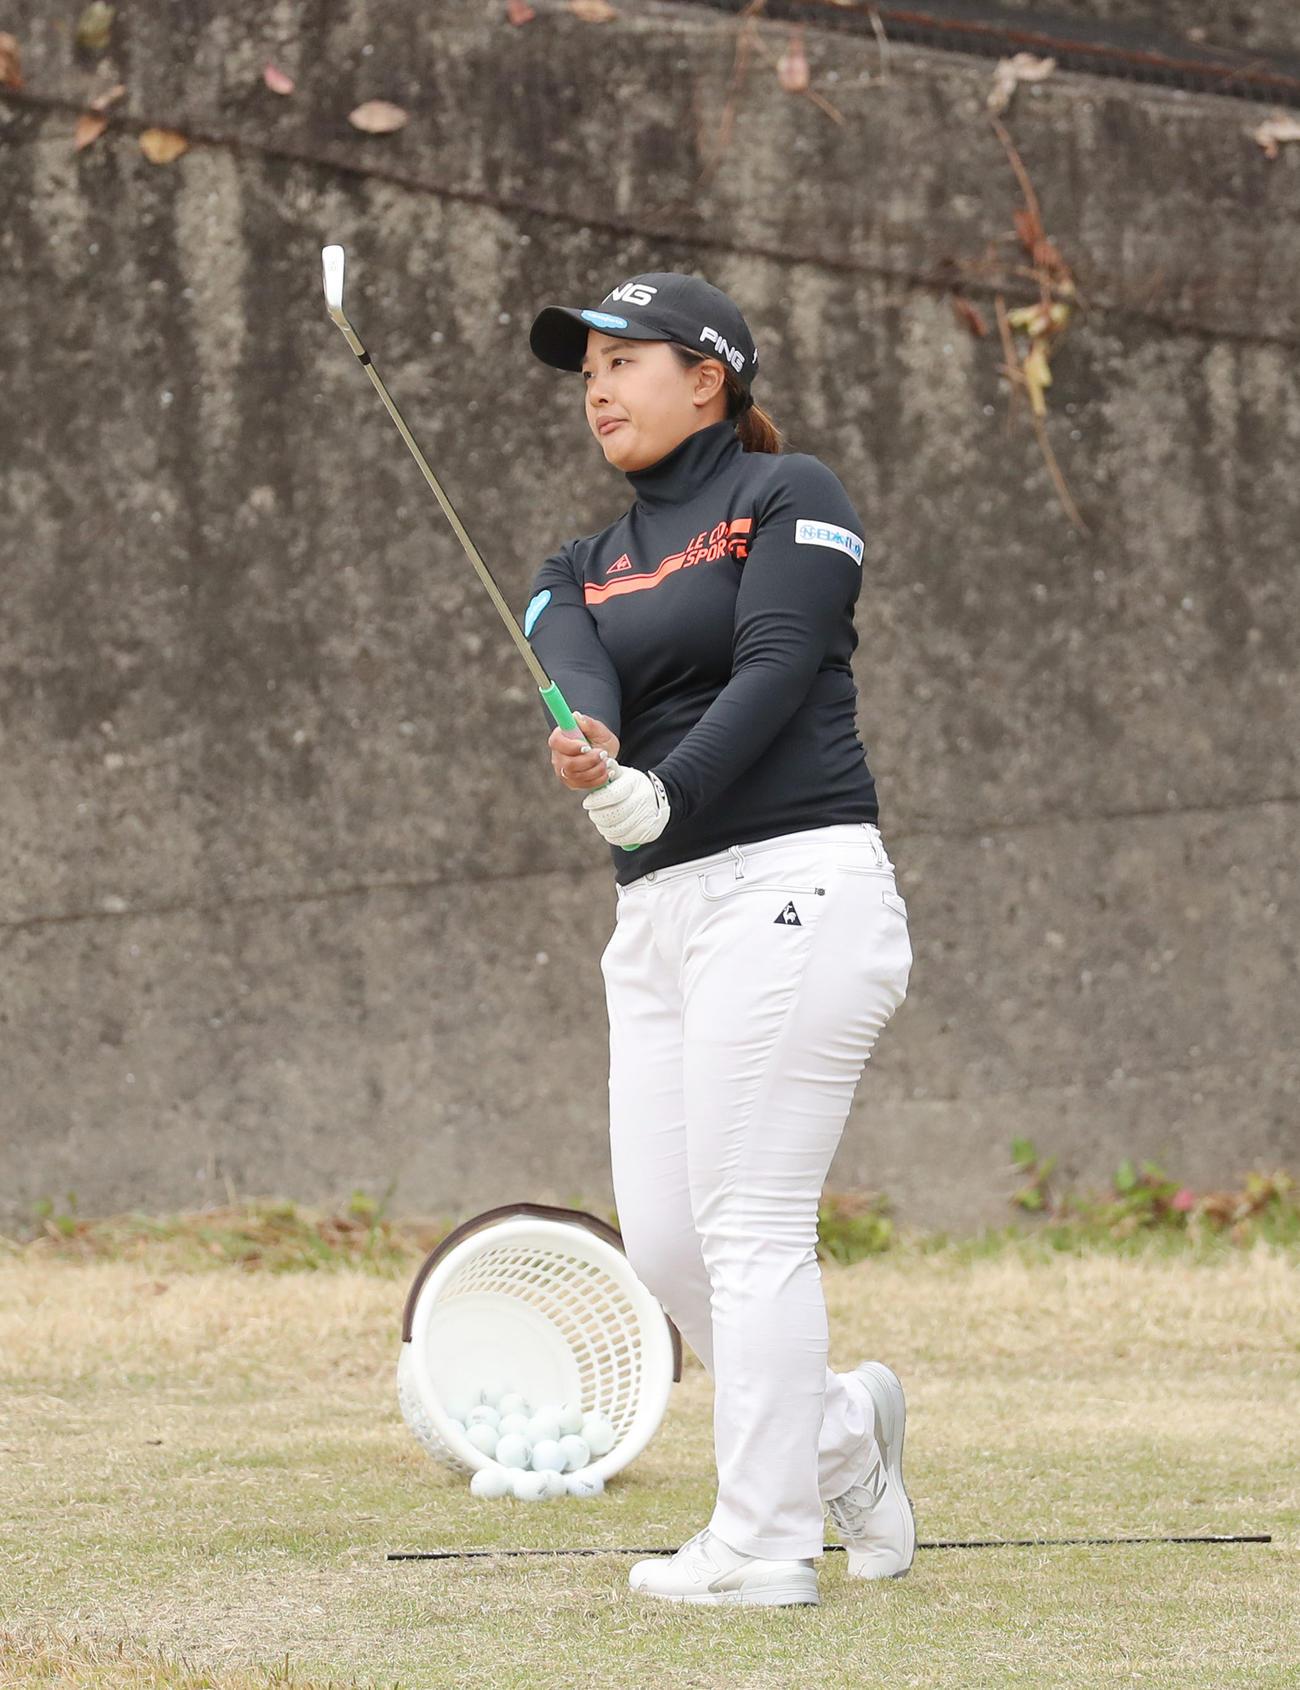 https://www.nikkansports.com/sports/golf/news/img/202103110000547-w1300_0.jpg